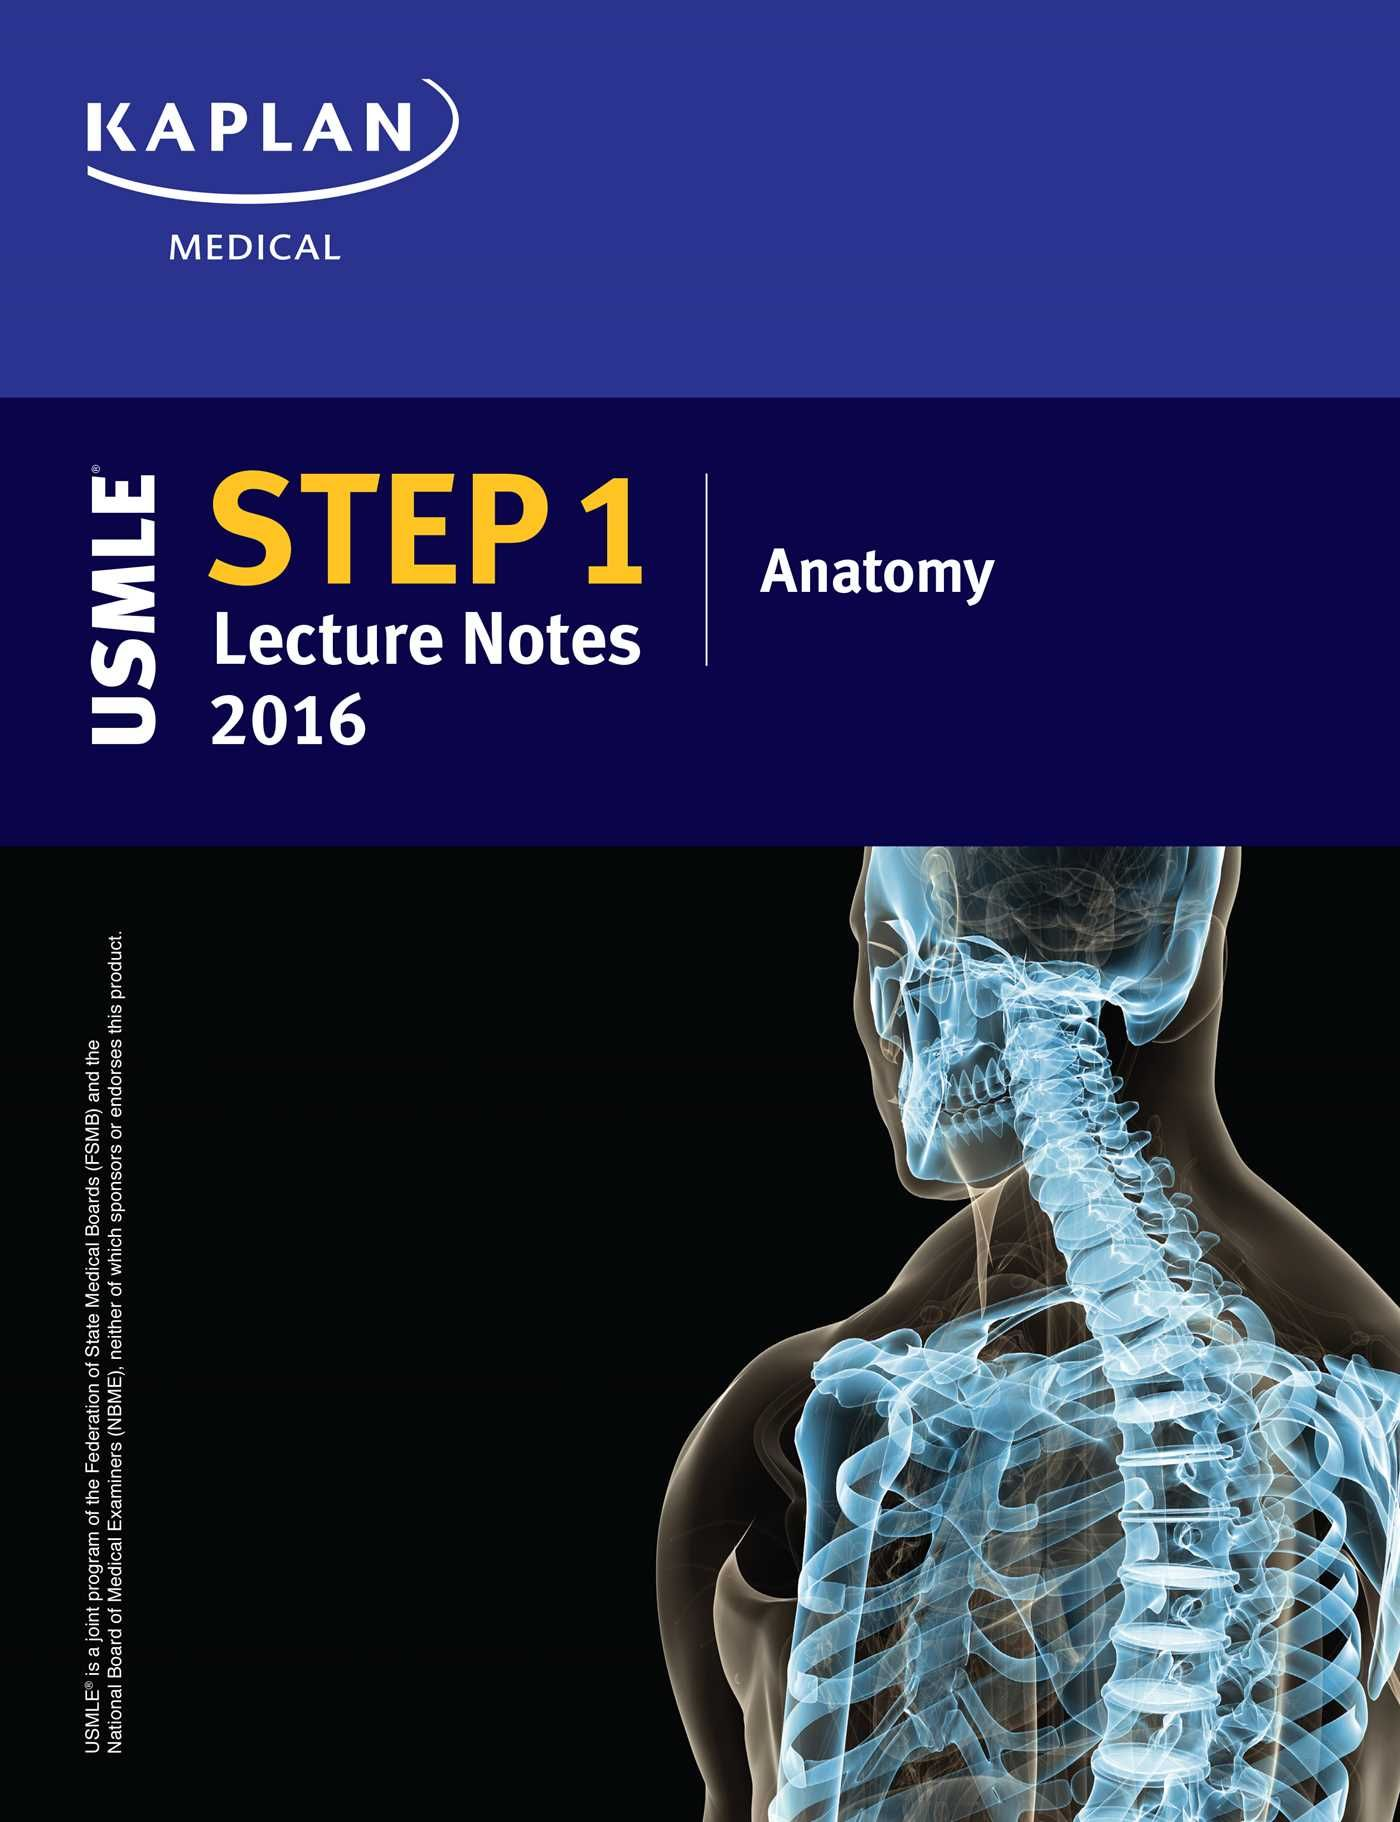 9781506200422 Usmle Step 1 Lecture Notes 2016 Anatomy Kaplan